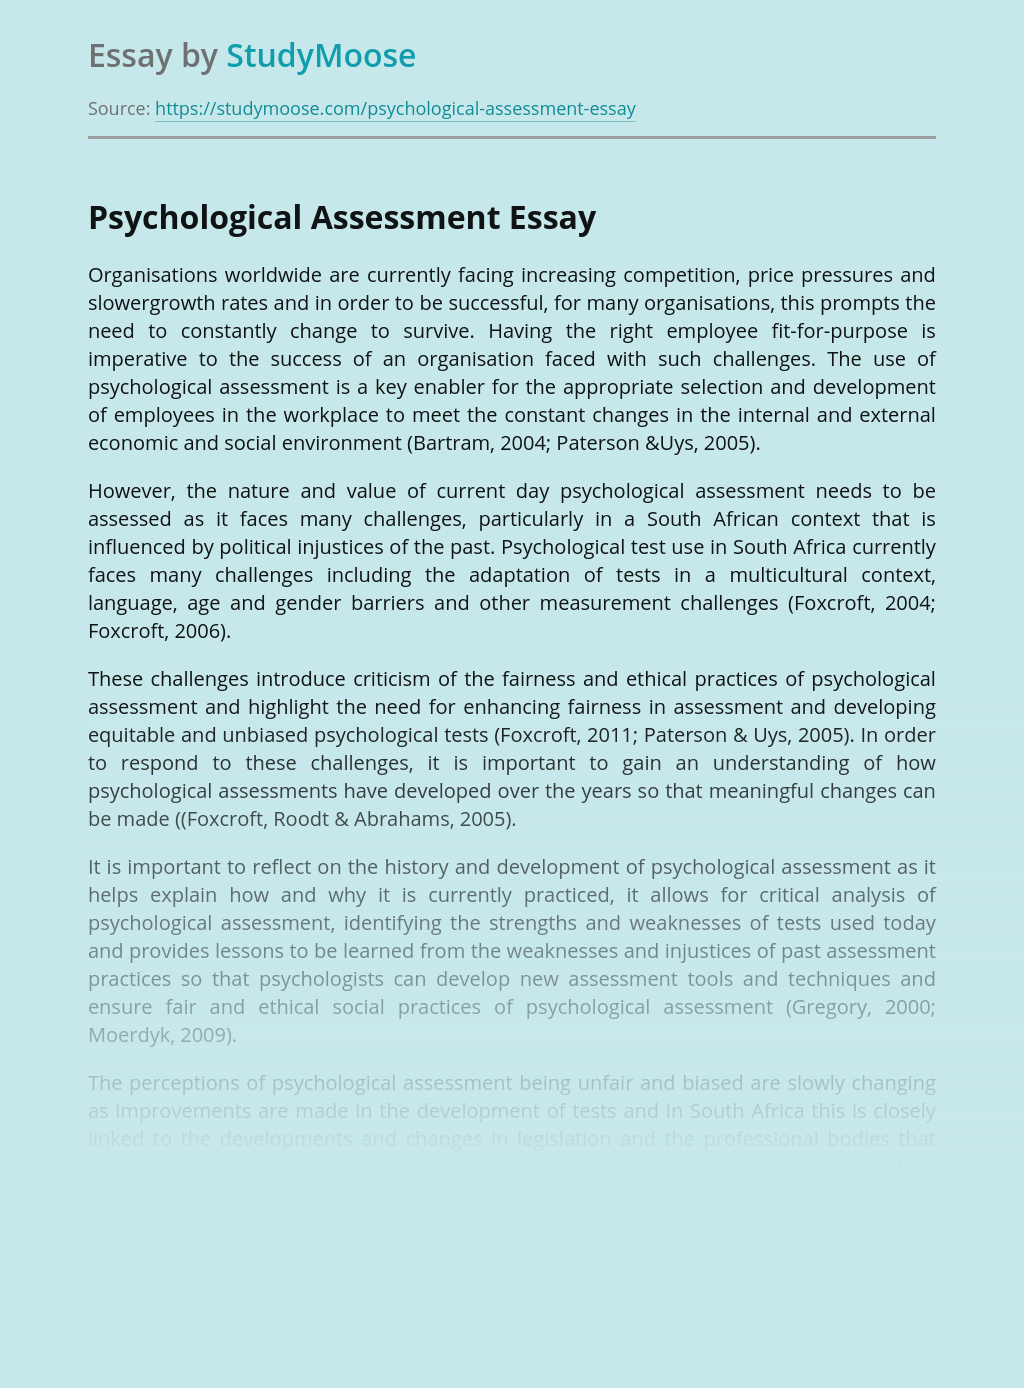 Psychological Assessment for Employment